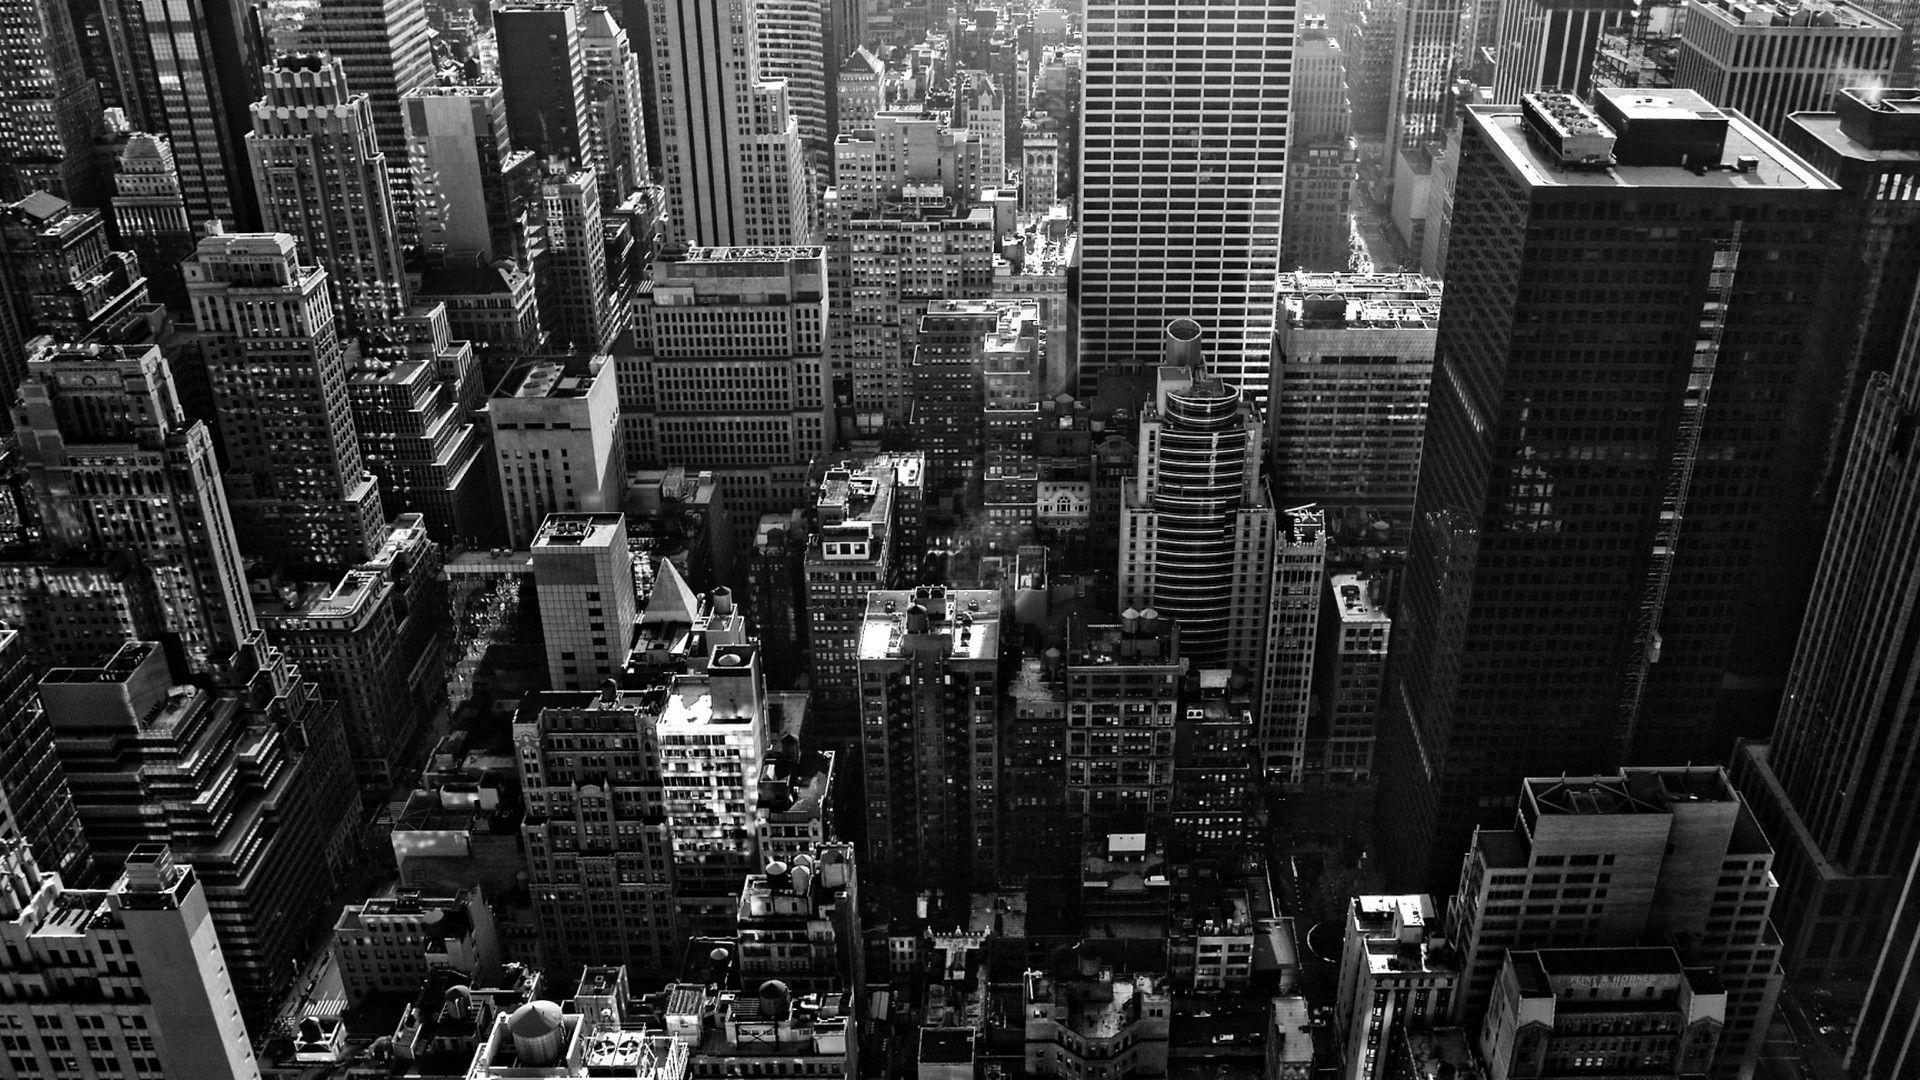 New York City Wallpaper USA Cityscape Statue Buildings Grey Black Shiny Silver